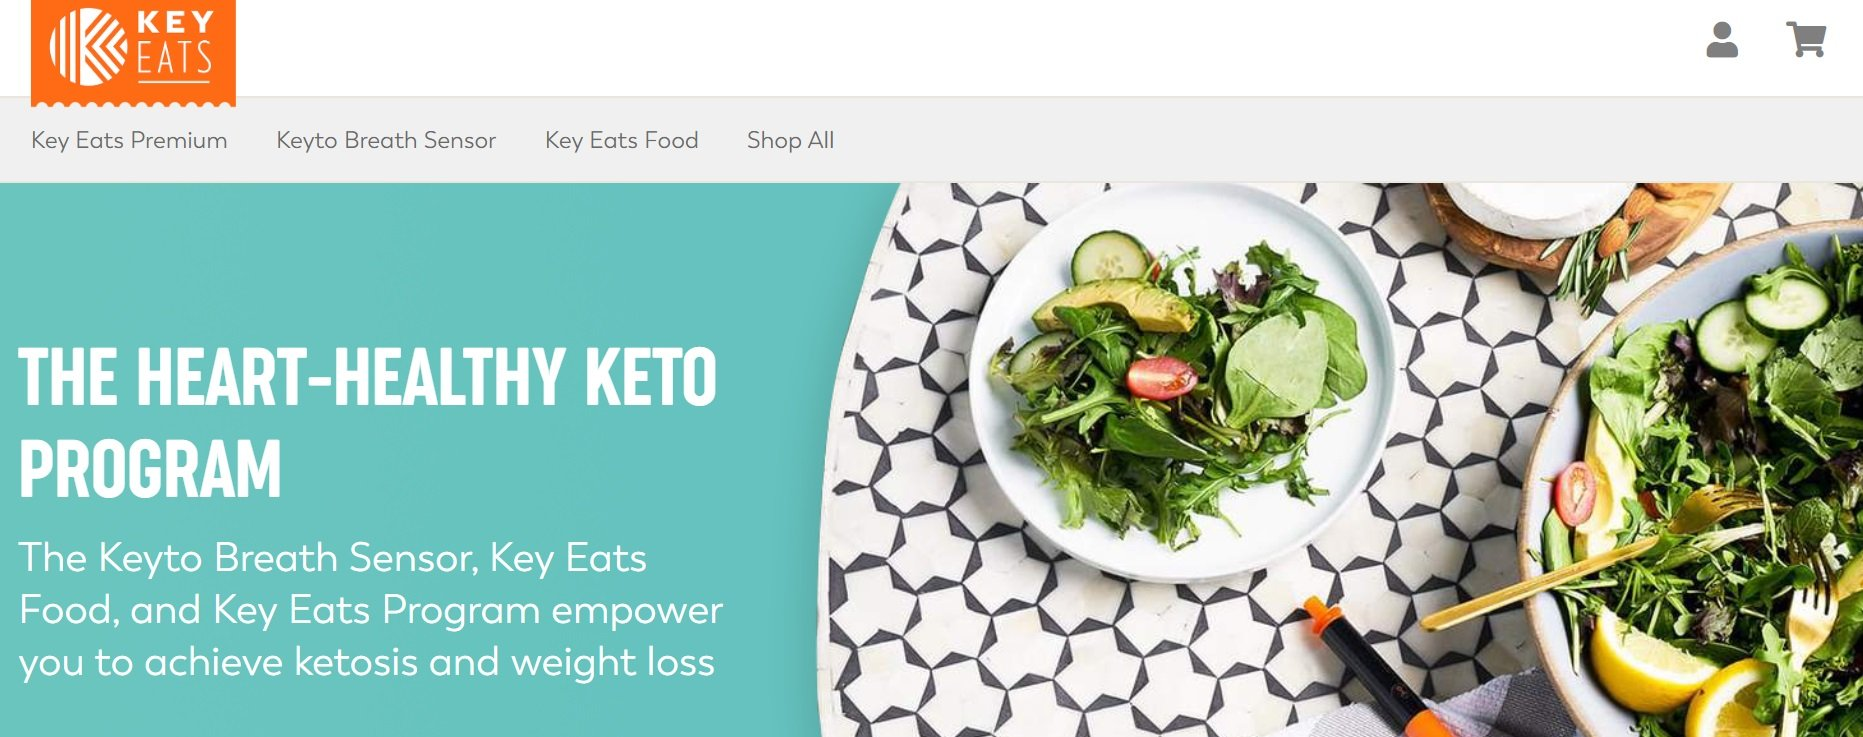 Key Eats Affiliate Program